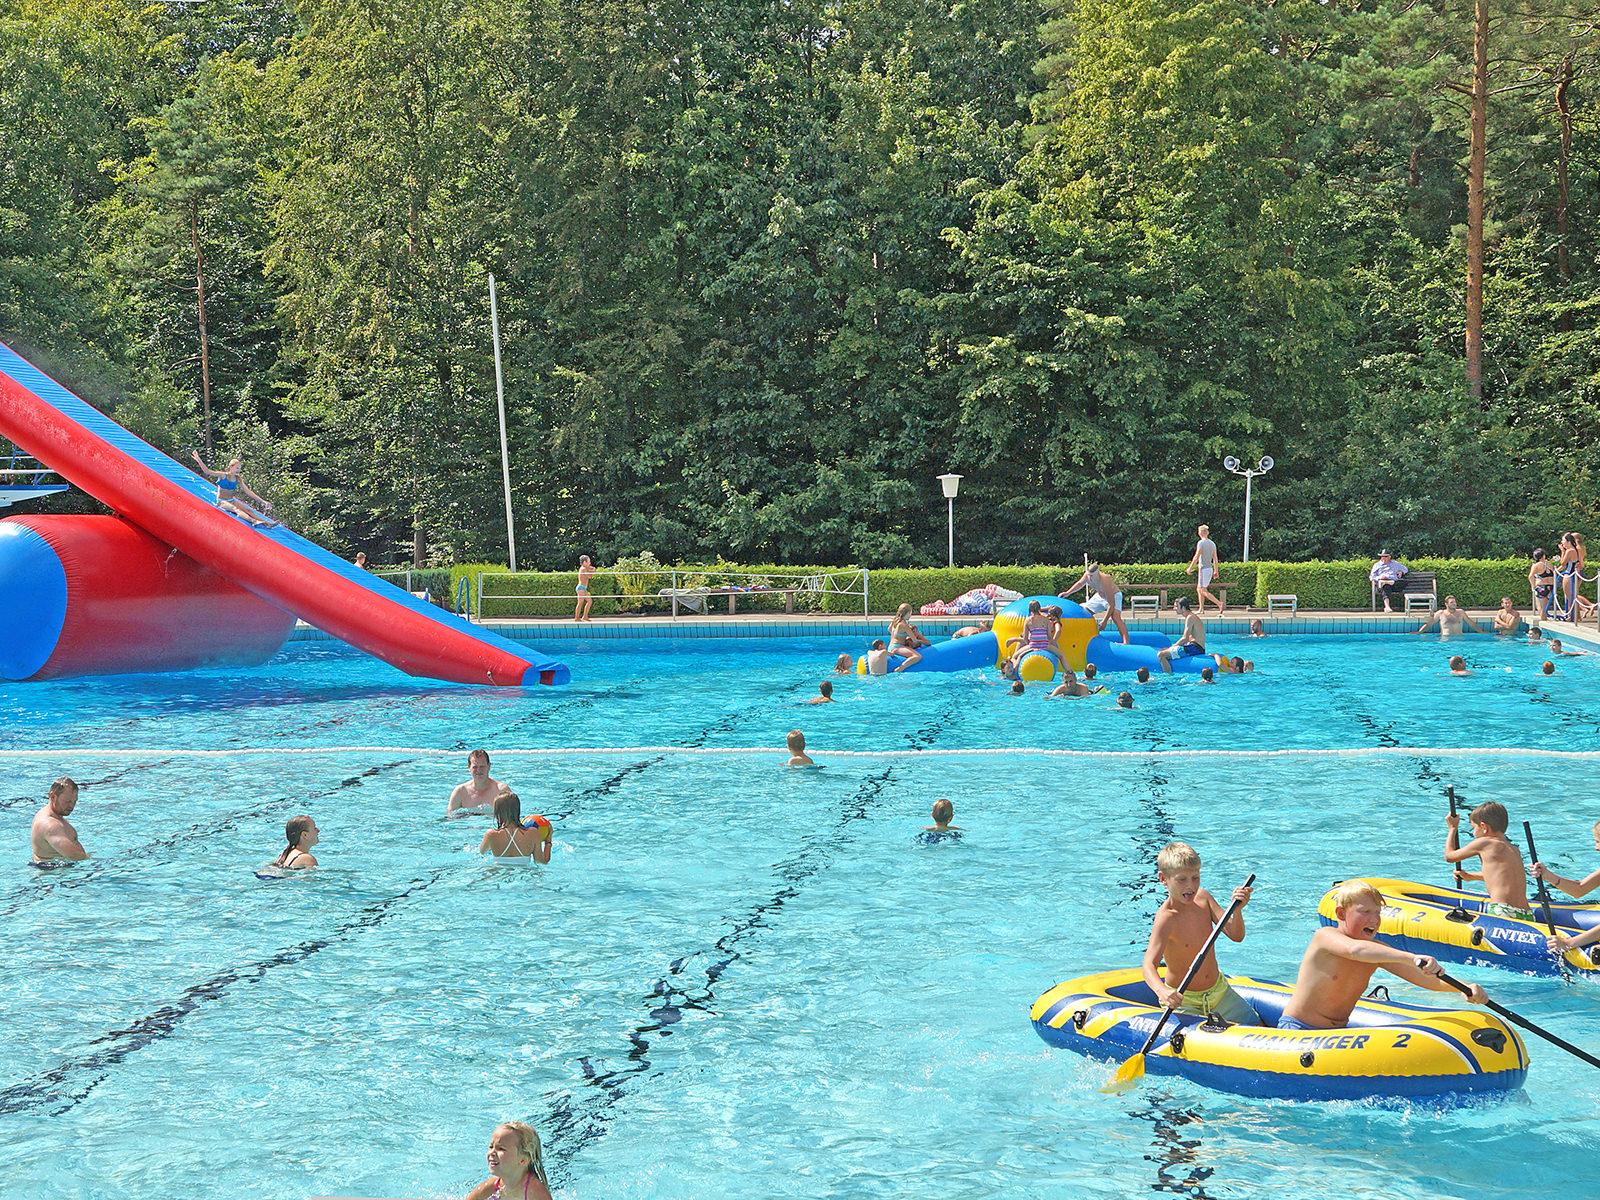 Kinderfest im Schwimmbad in Bleckede